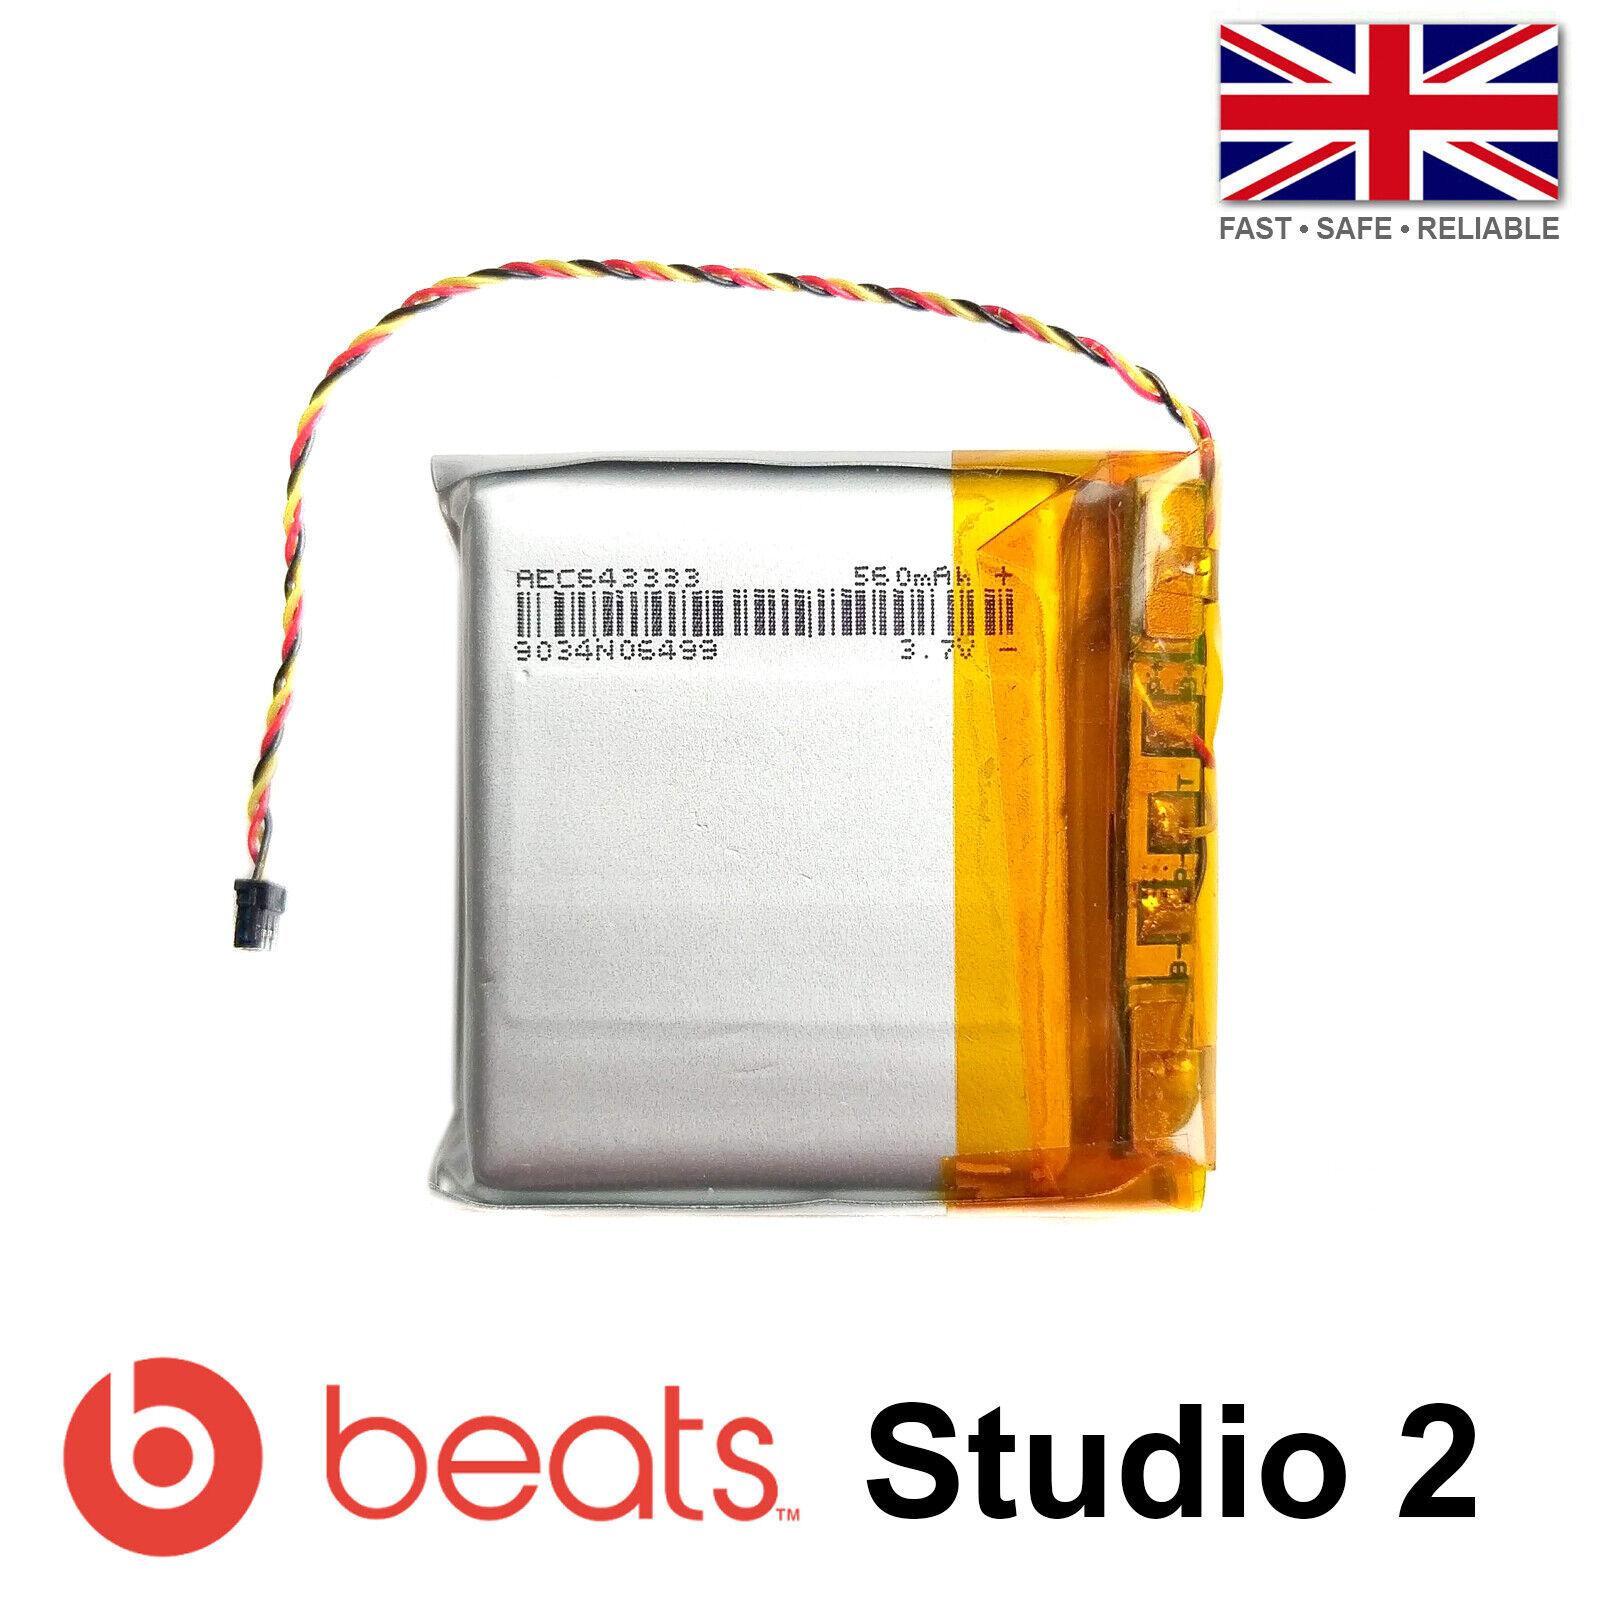 Beats Studio 2.0 Rechargeable Battery - 3.7V 560mAh LiPo AEC643333